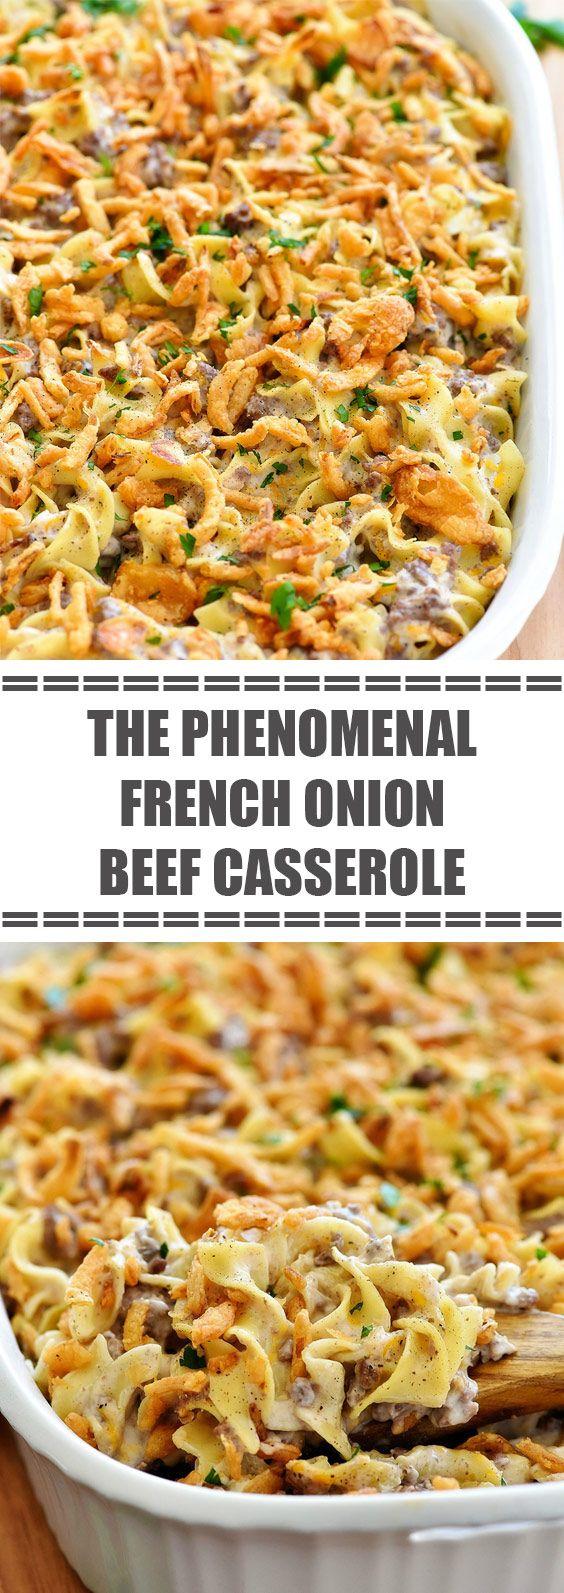 The Phenomenal French Onion Beef Casserole Bookinghotel Live Beef Casserole Recipes French Casserole Recipe Beef Casserole